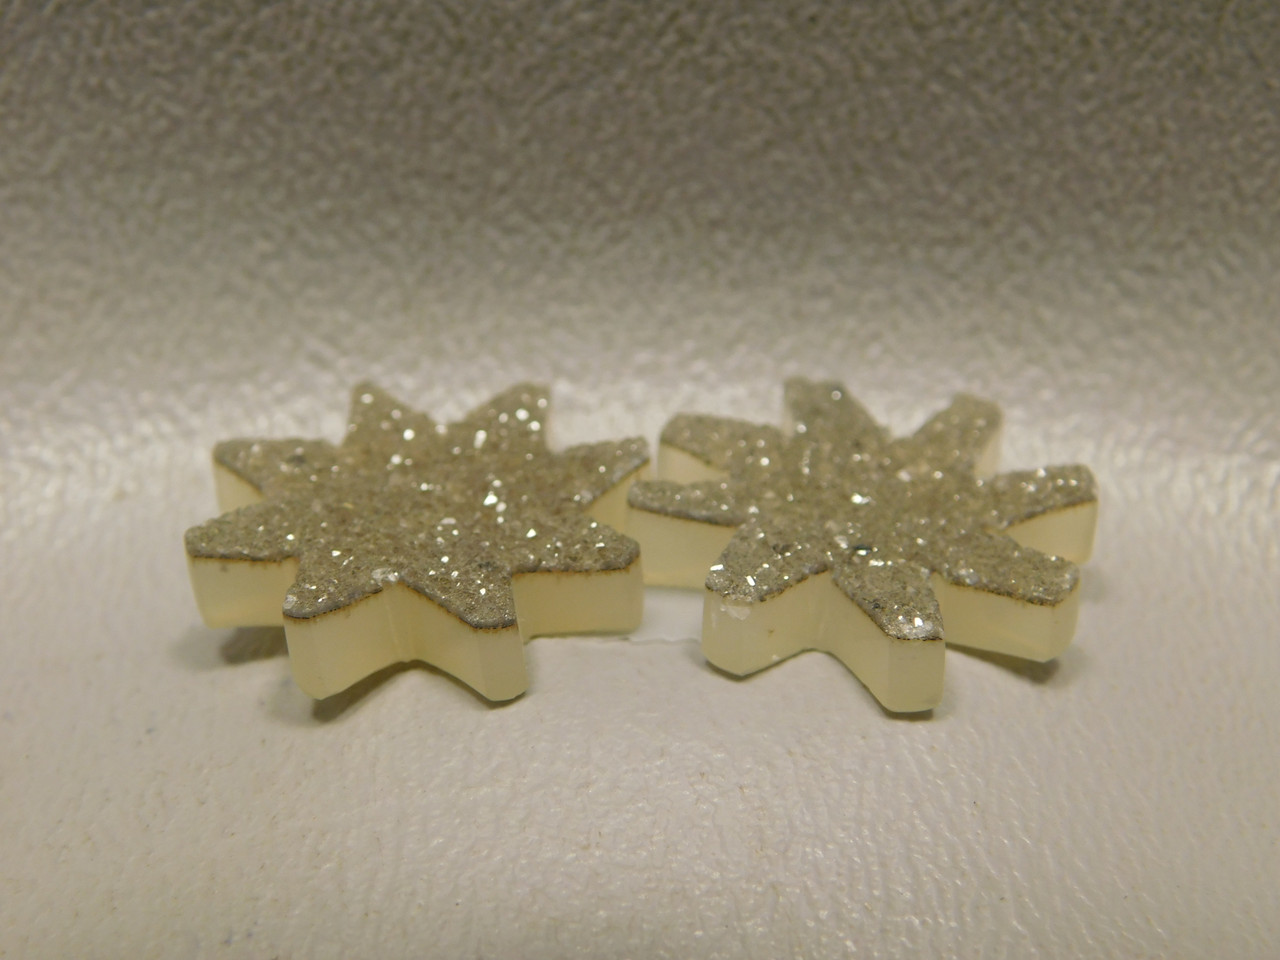 Agate Drusy Druse 19 mm Freeform Starburst Cabochon Matched Pair #4